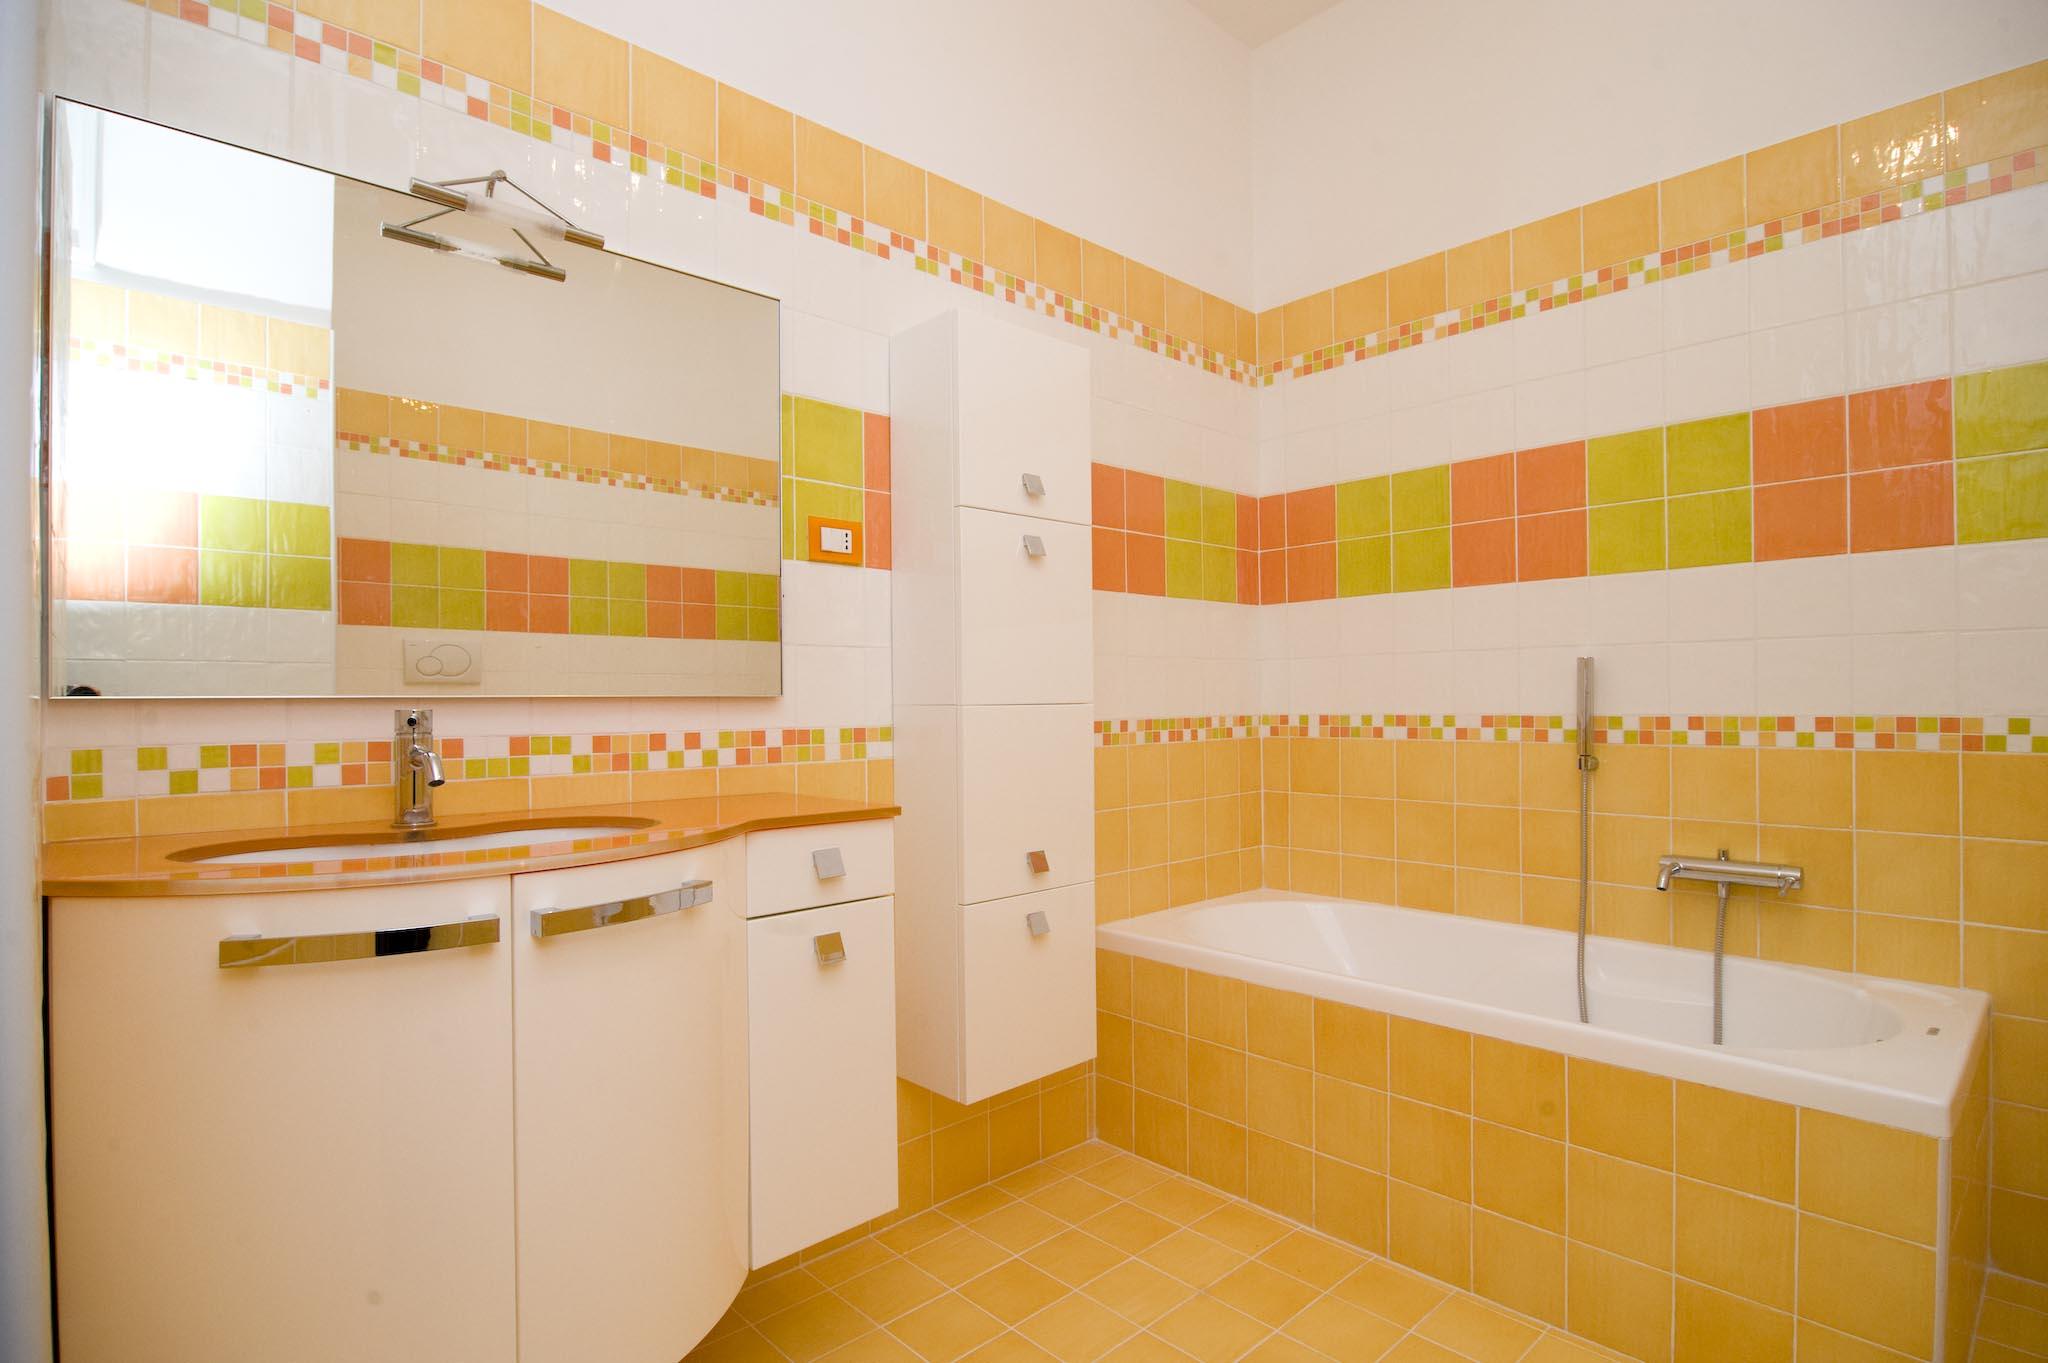 Rifacimento bagno completo impresa edile - Rifacimento bagno ...